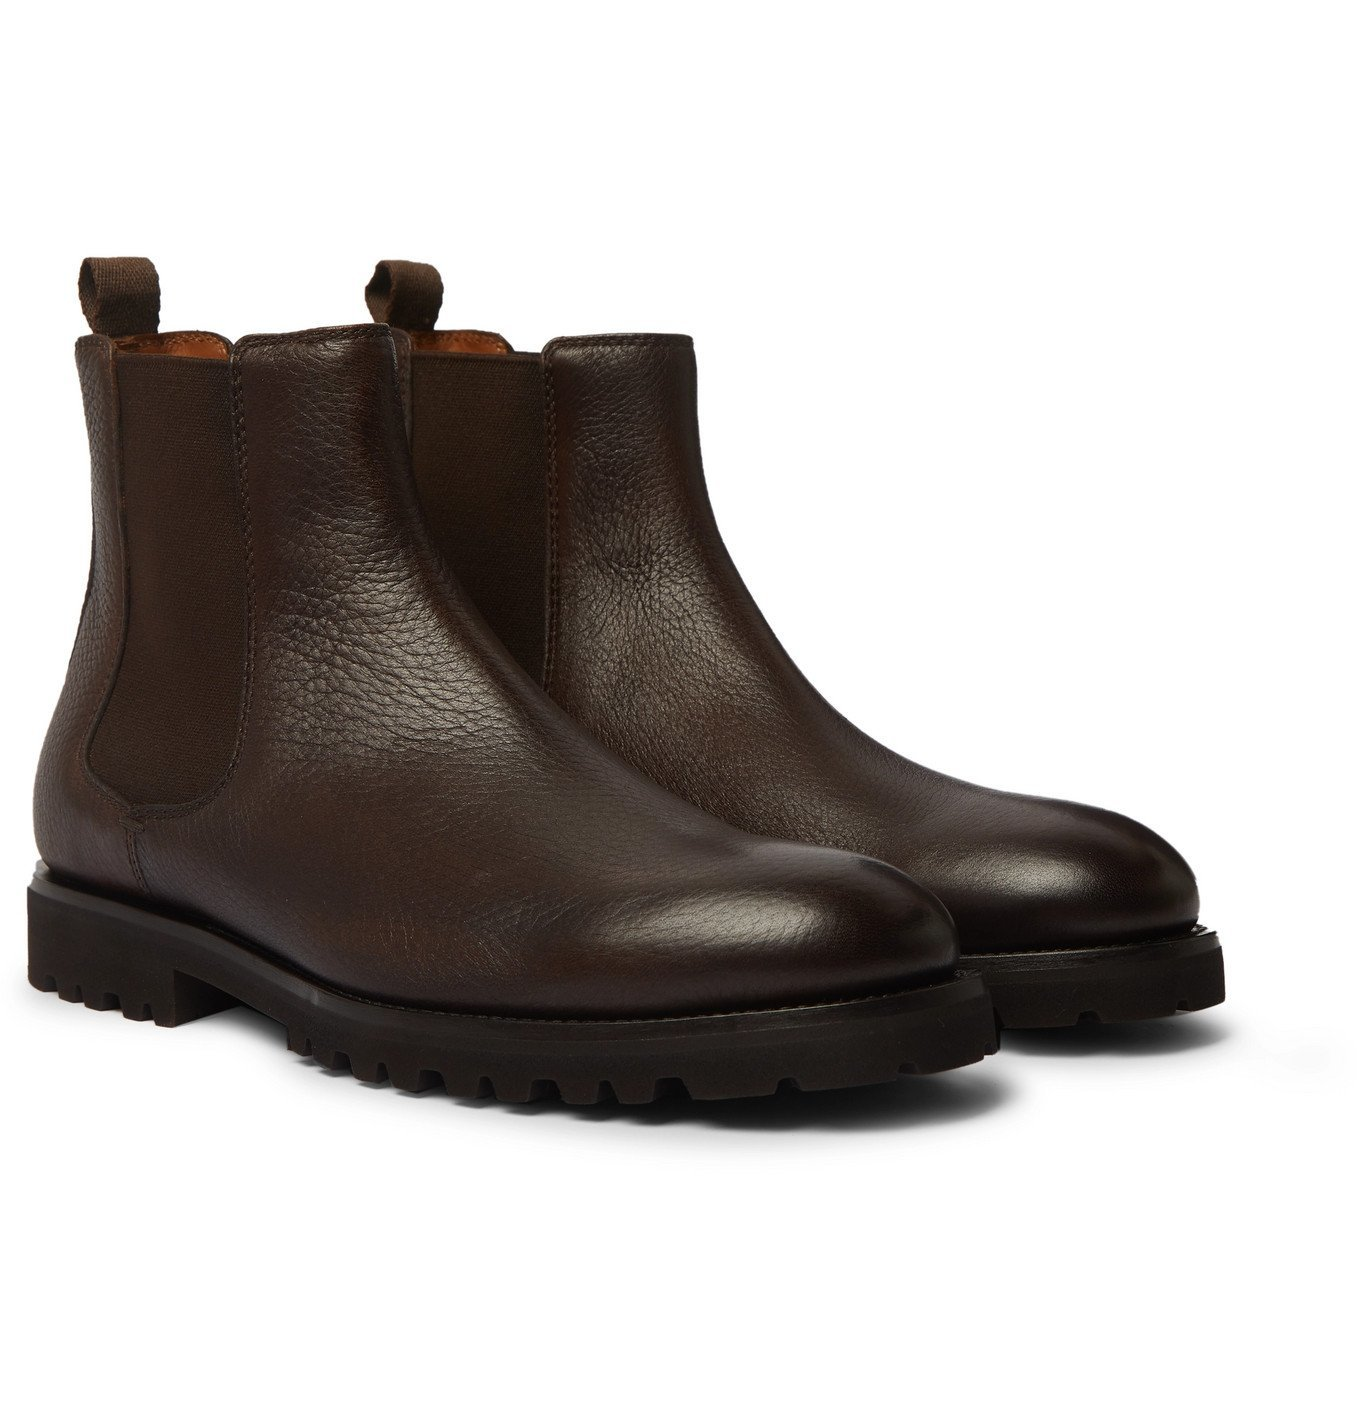 Photo: Brunello Cucinelli - Full-Grain Leather Chelsea Boots - Brown